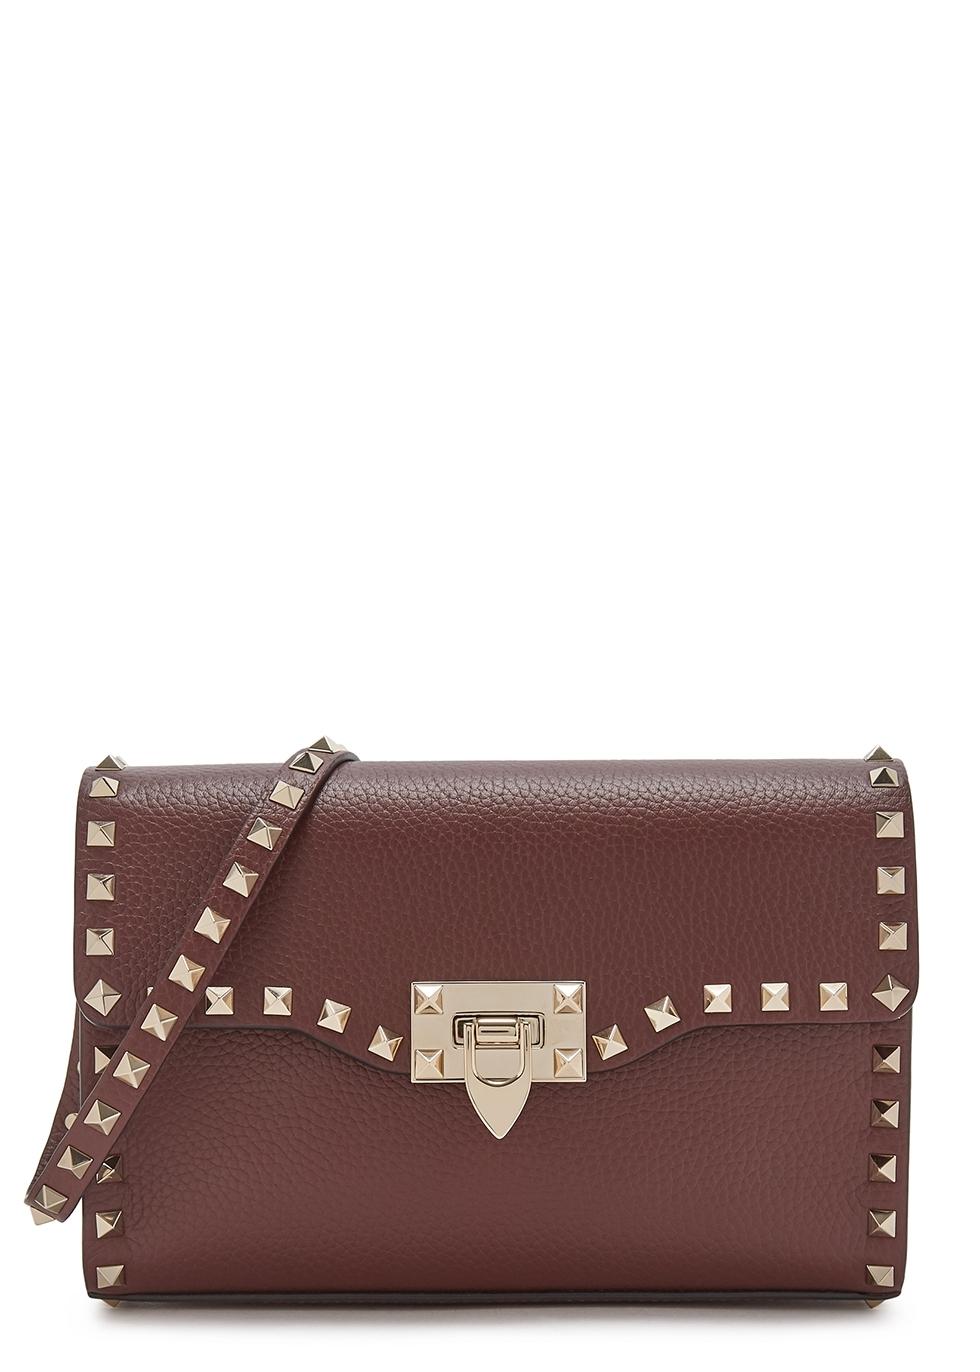 17c4eec2e3 Women's Designer Shoulder Bags - Harvey Nichols